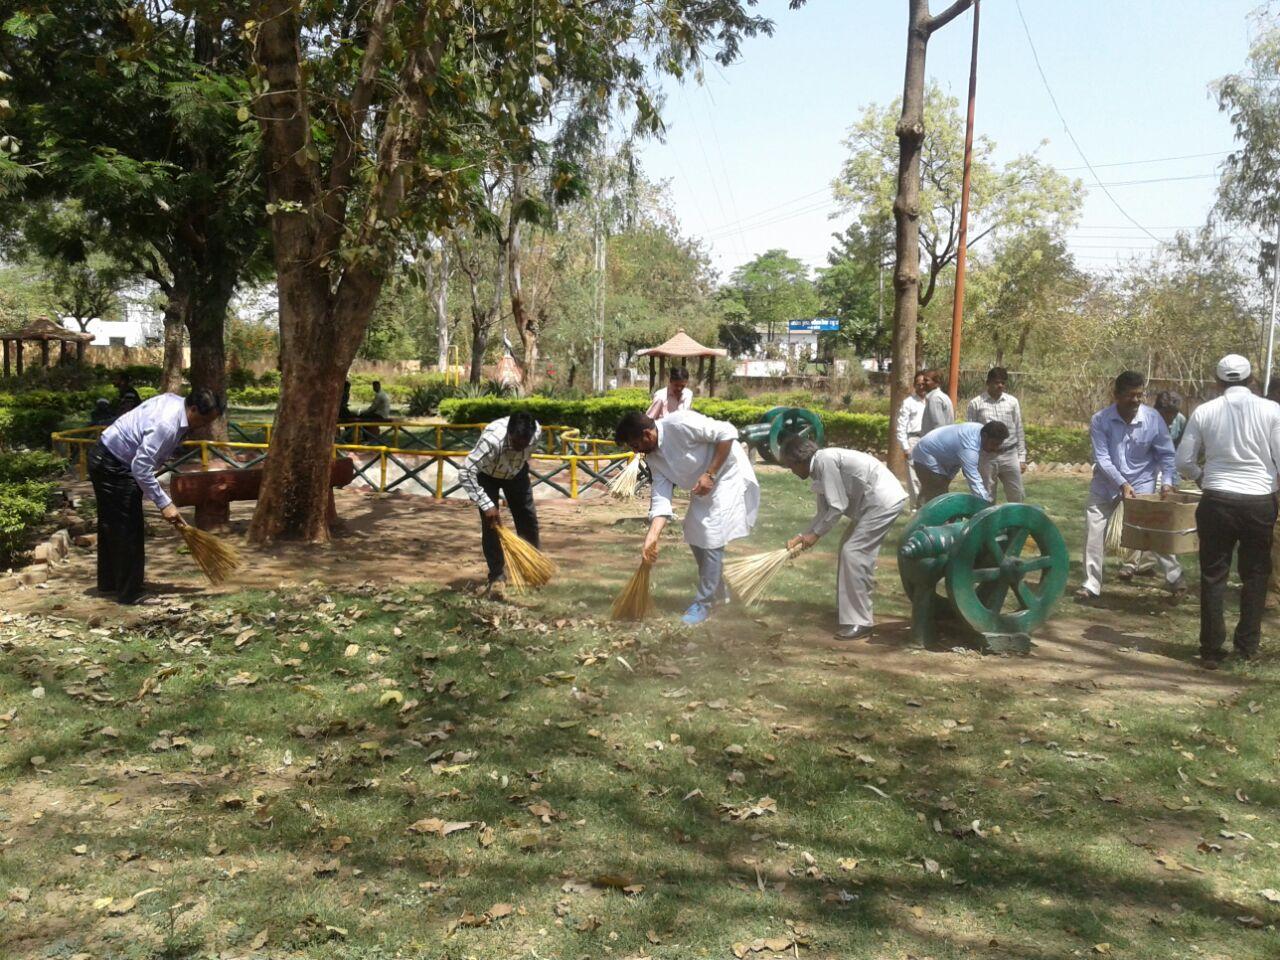 Diploma-Engineers-Association-launched-Sanitation-Campaign-डिप्लोमा इंजीनियर्स एसोसिएशन ने चलाया स्वच्छता अभियान